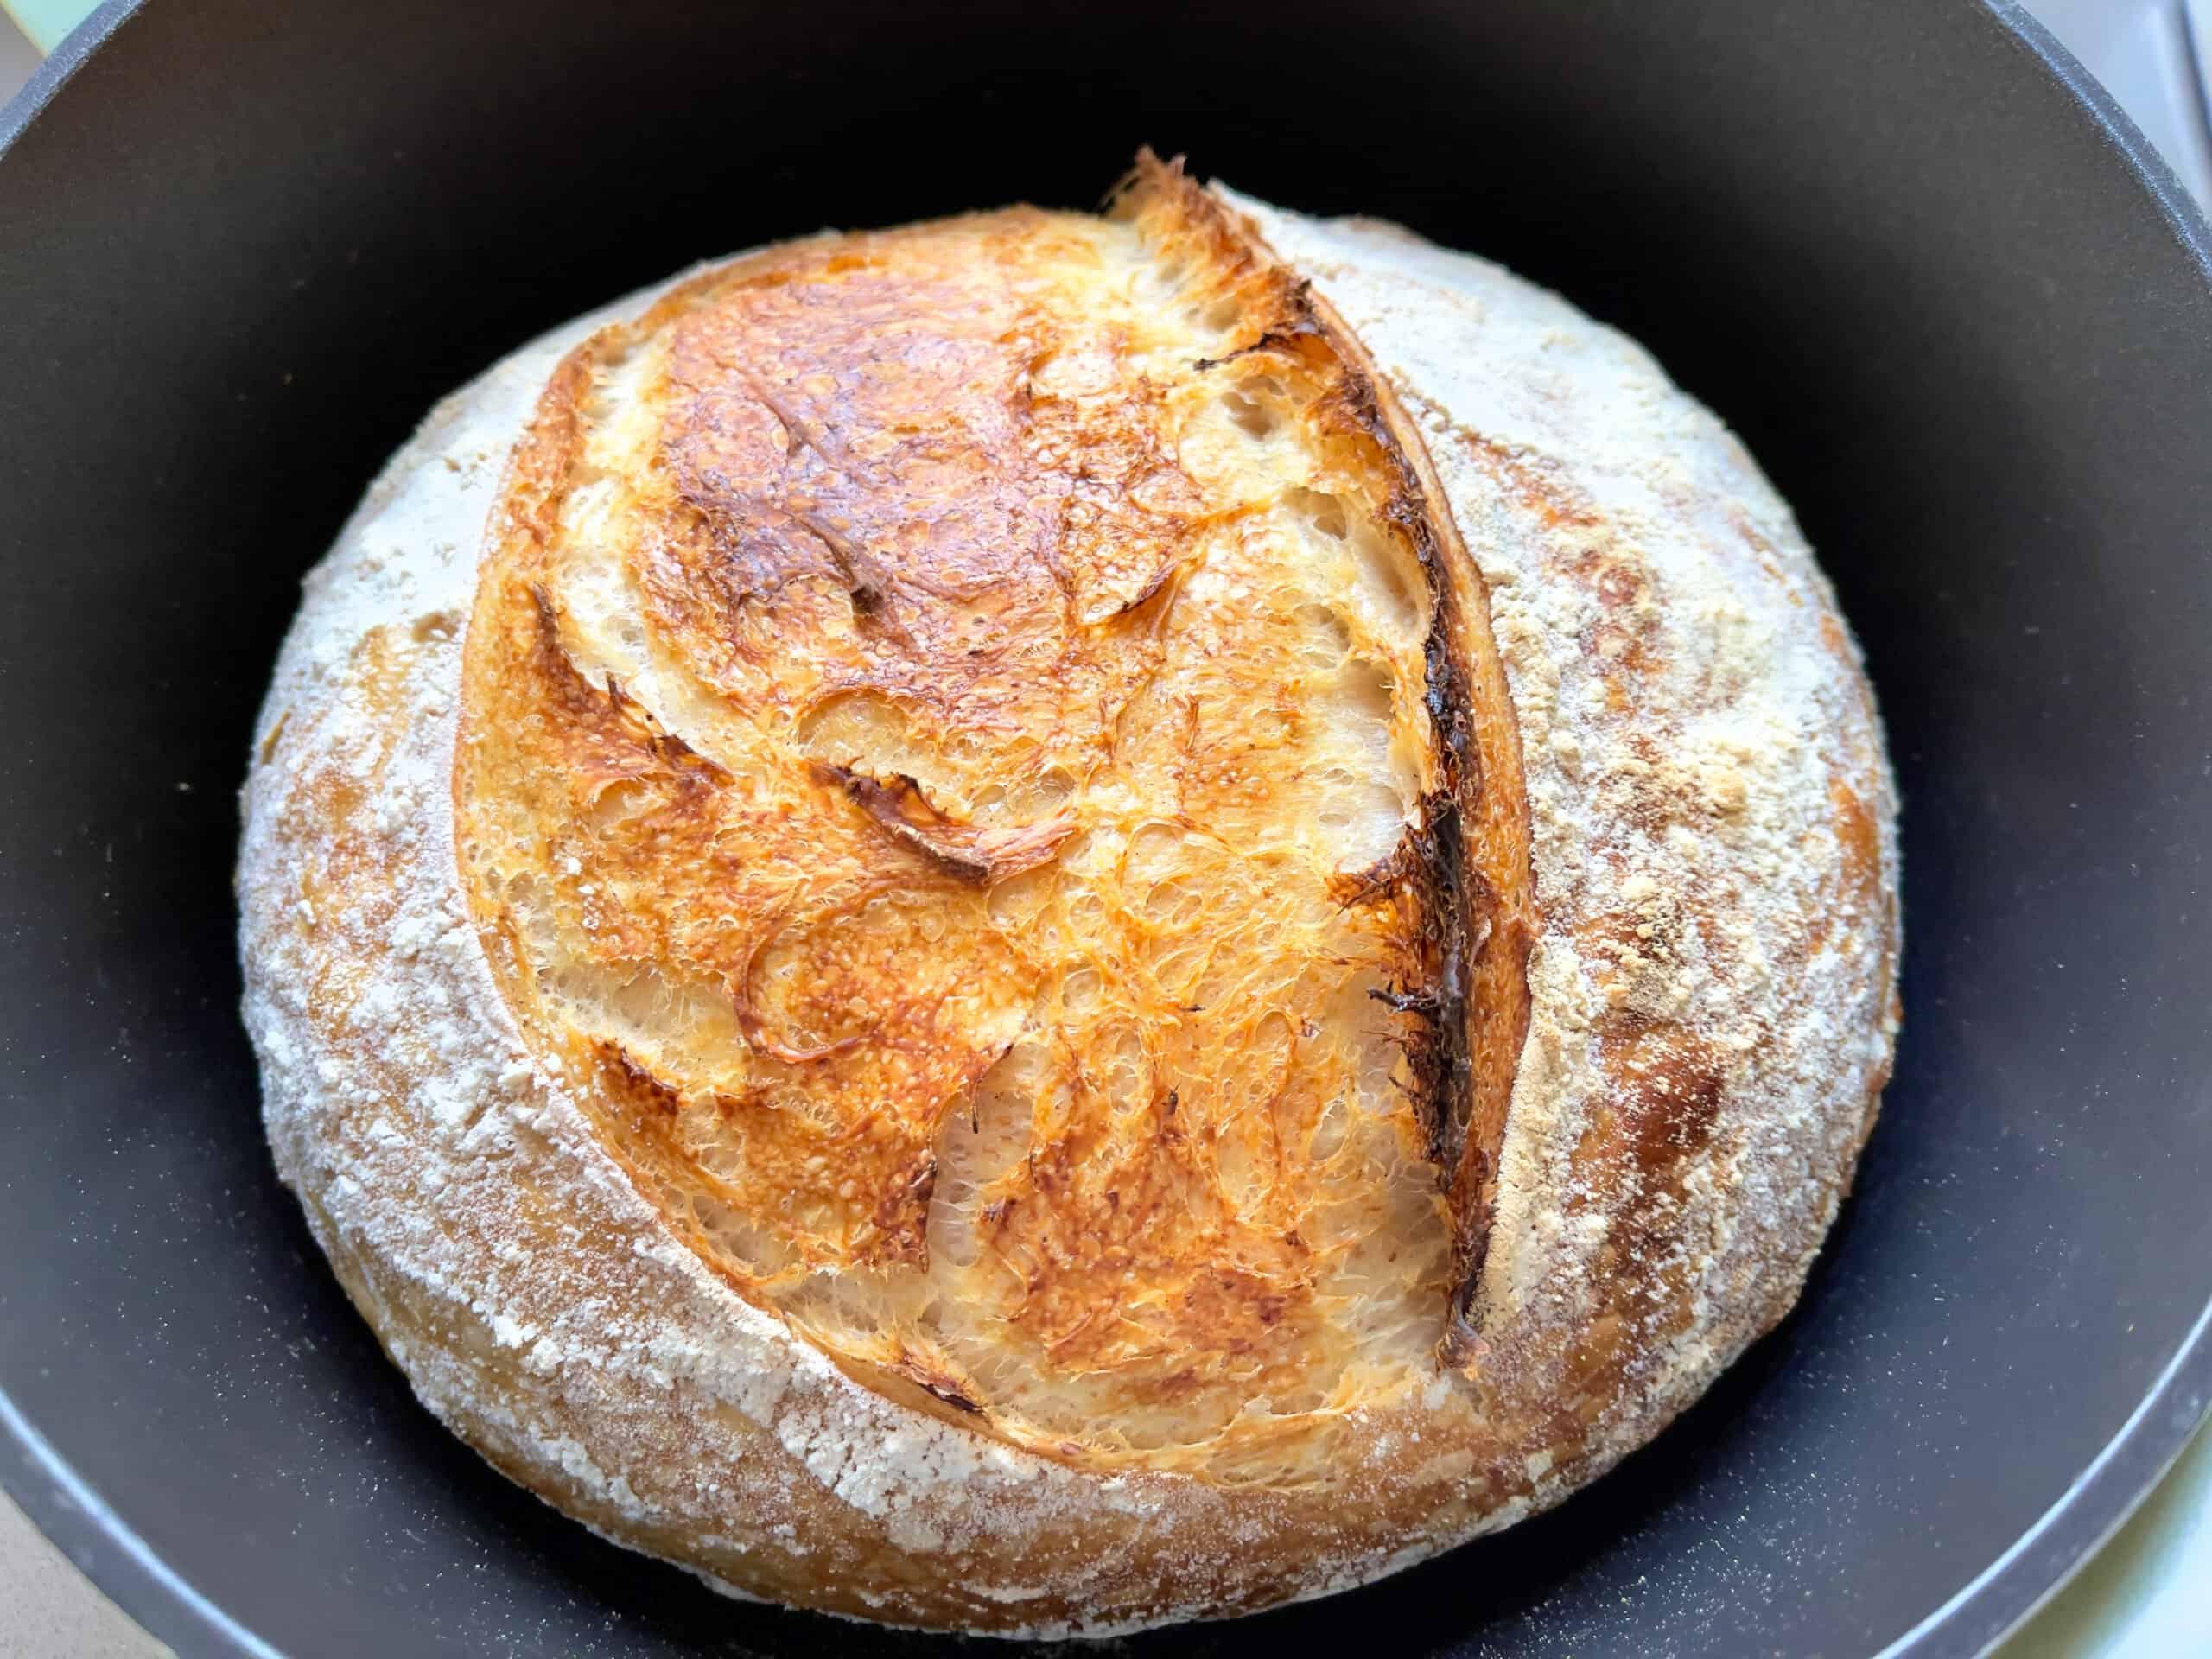 Beginners sourdough bread recipe (Bread with prozimi) baked